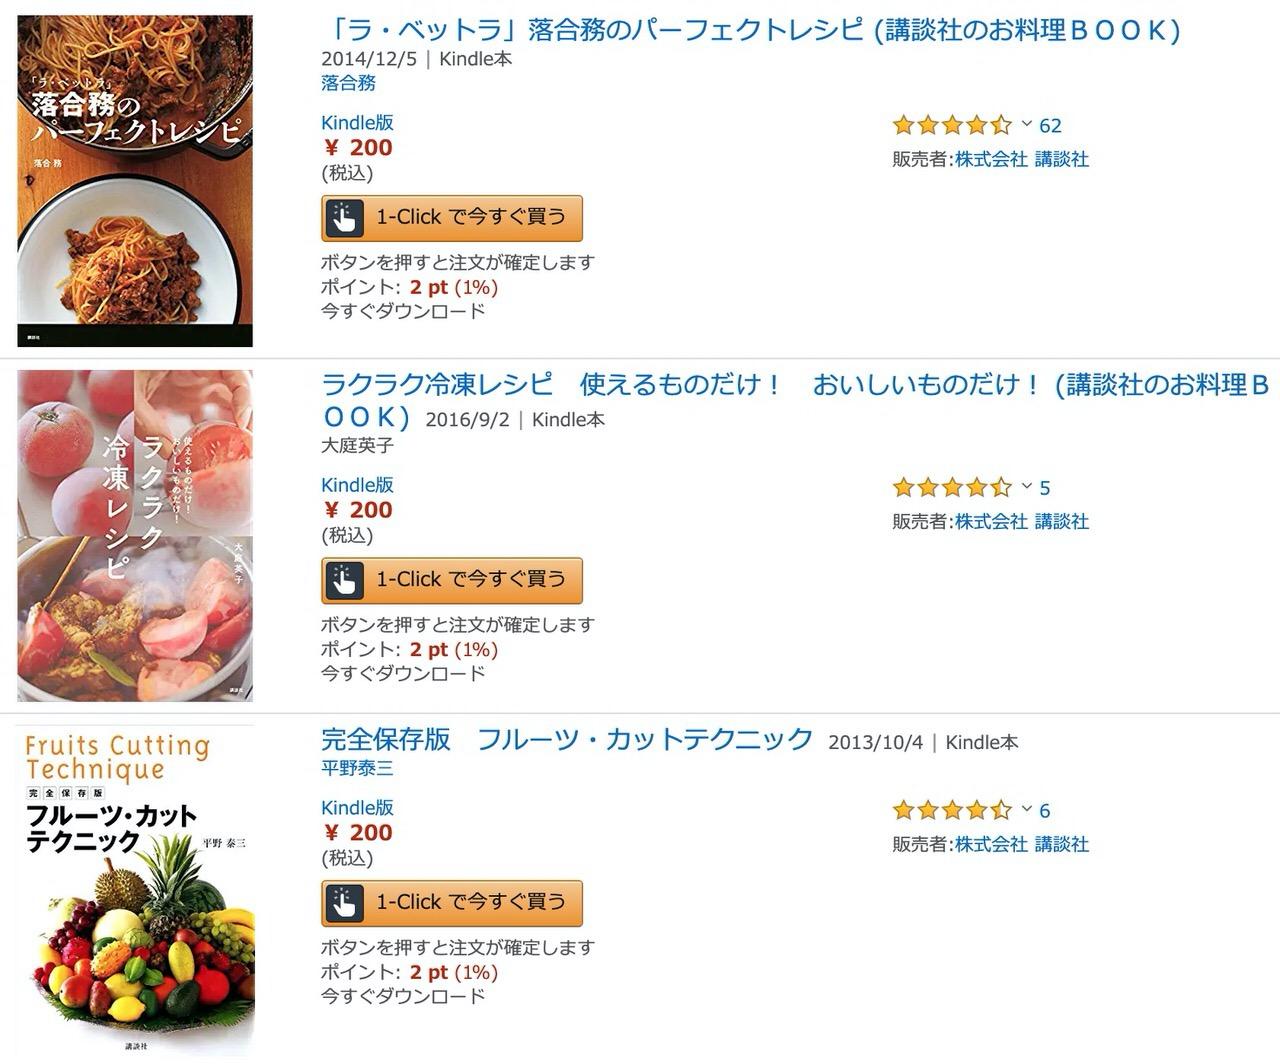 【Kindleセール】200円均一「冬☆電書2020 レシピ本フェア」(1/16まで)